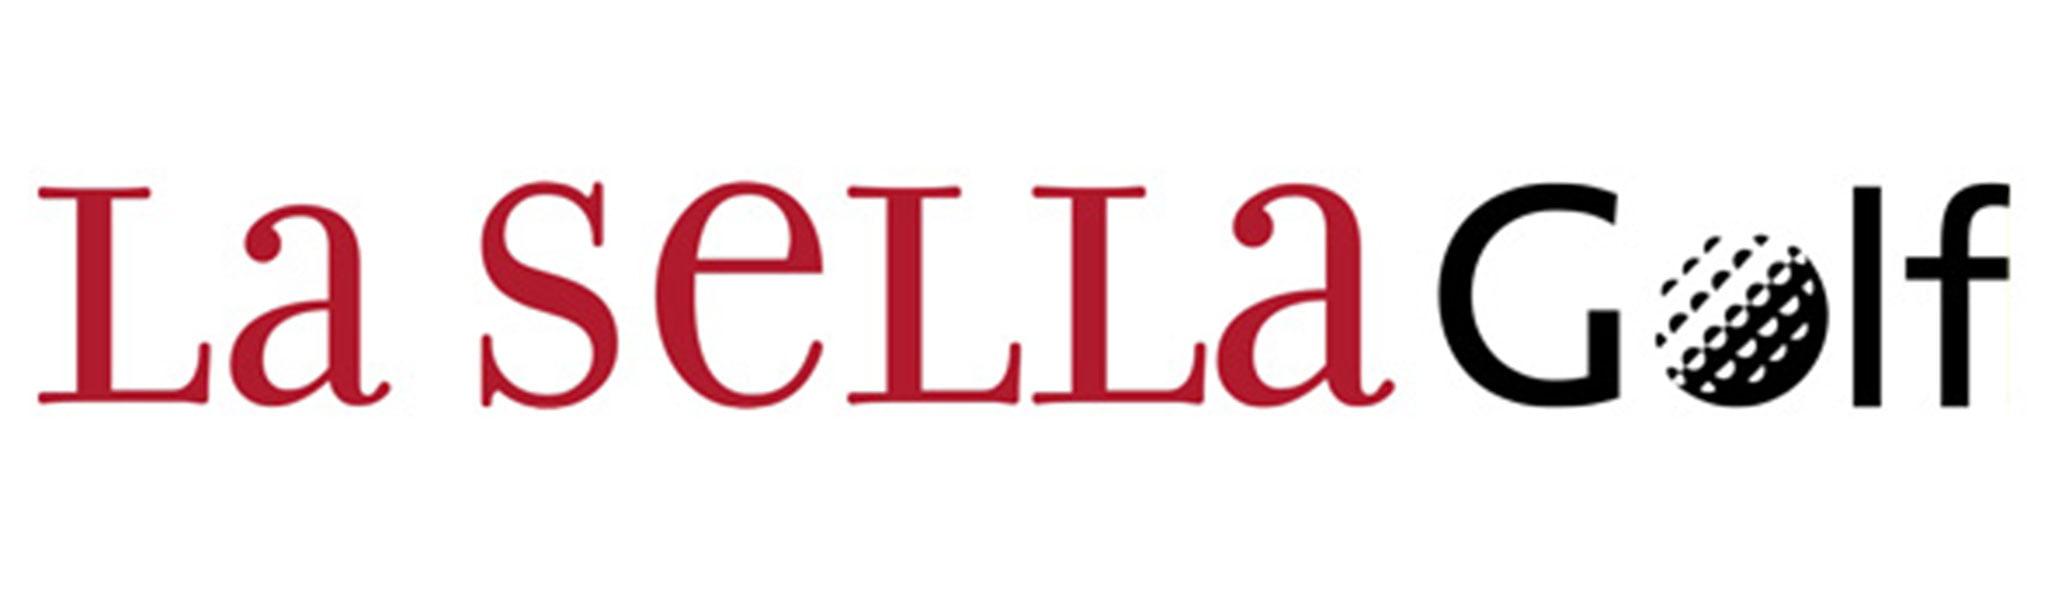 La Sella Golf's logo